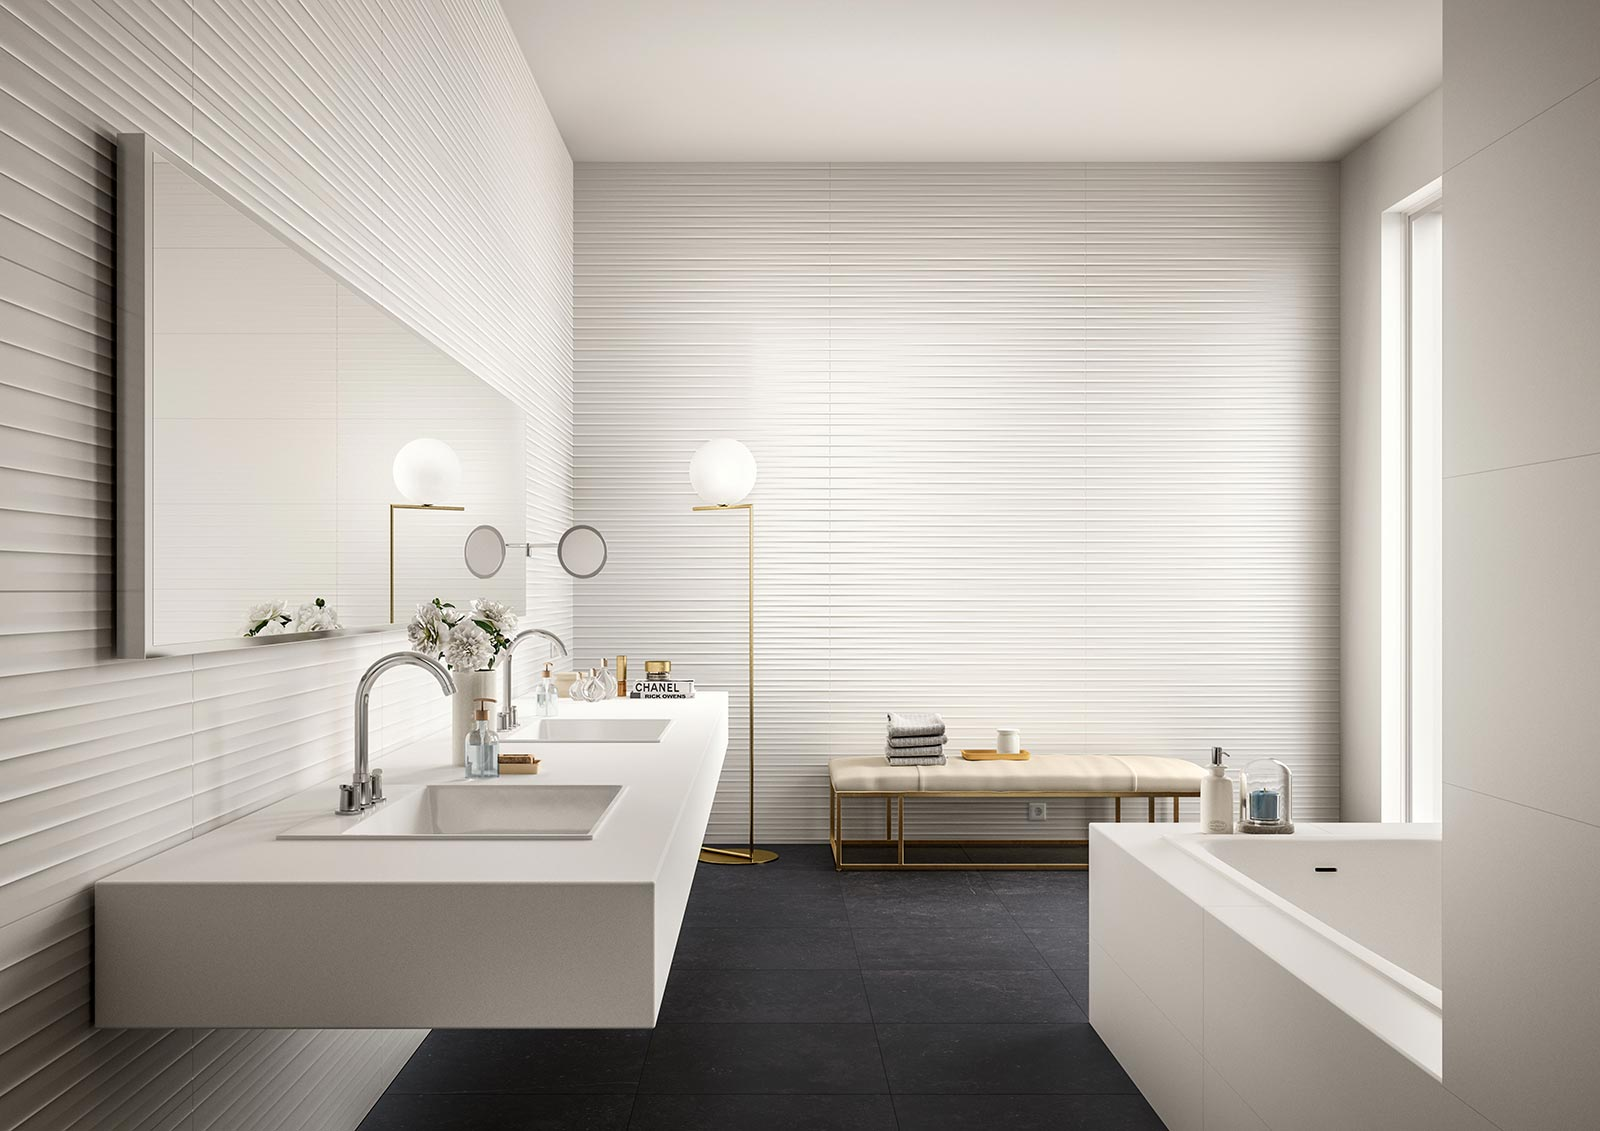 Fliesen f r das bad marazzi - Masquer carrelage salle de bain ...